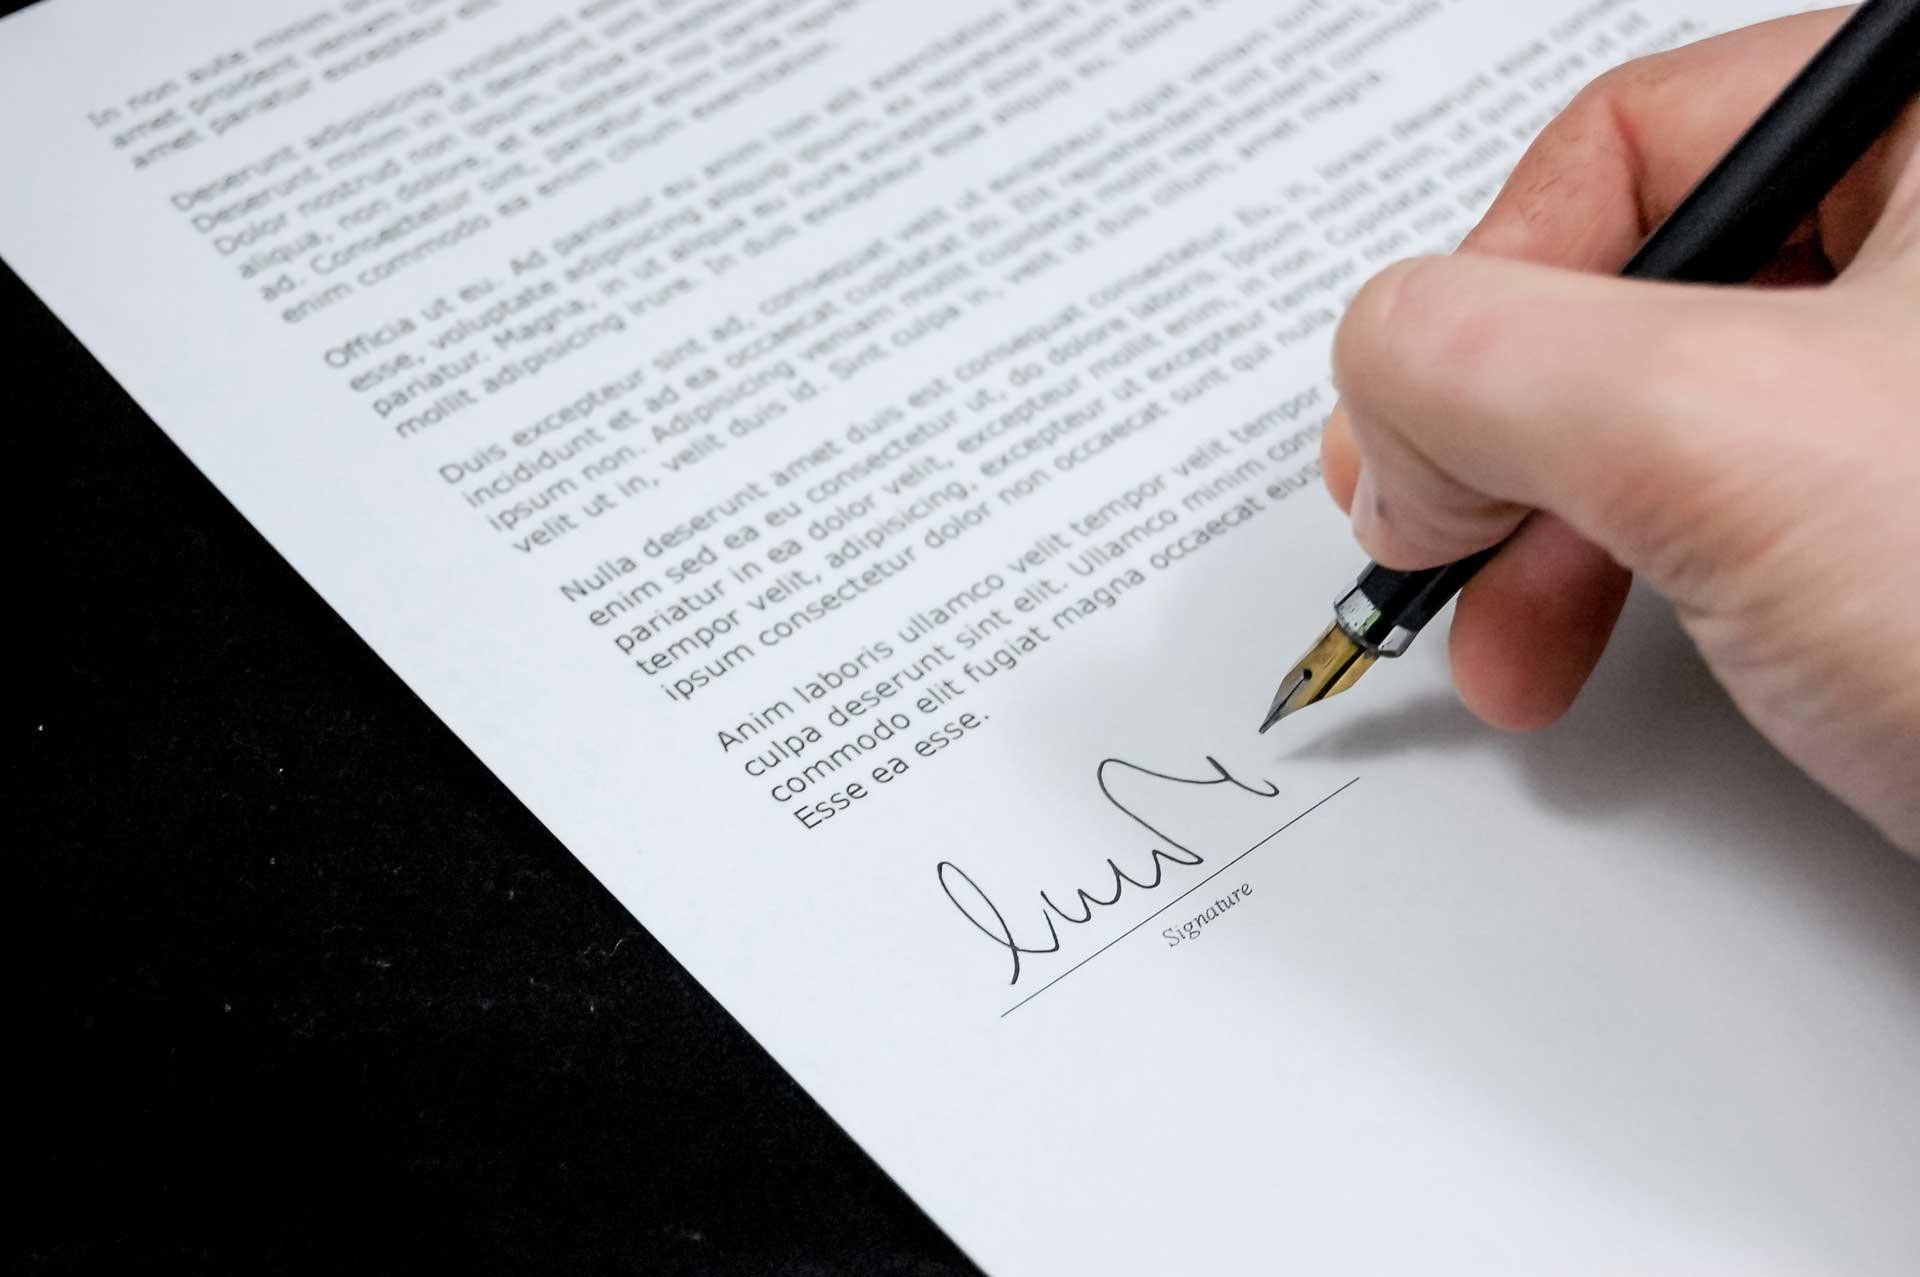 Signature d'un document